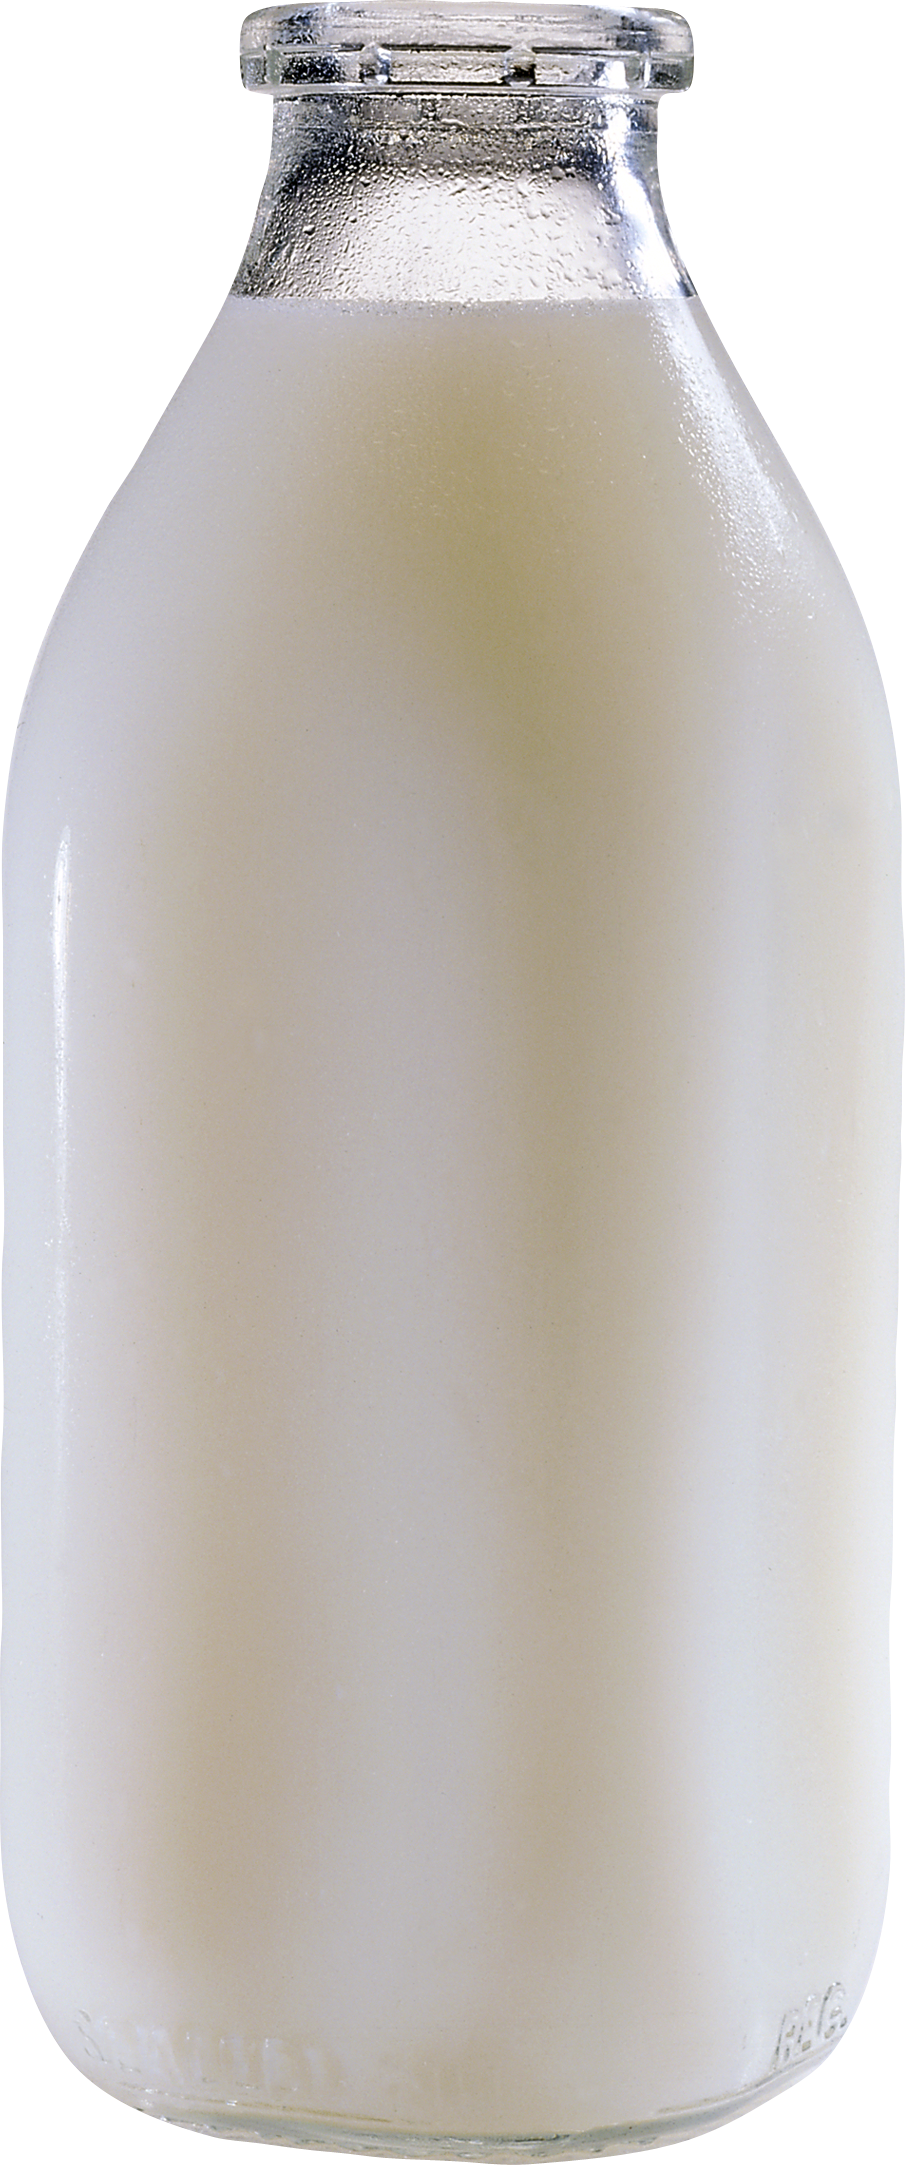 Milk bottle PNG - Milk Jug PNG HD